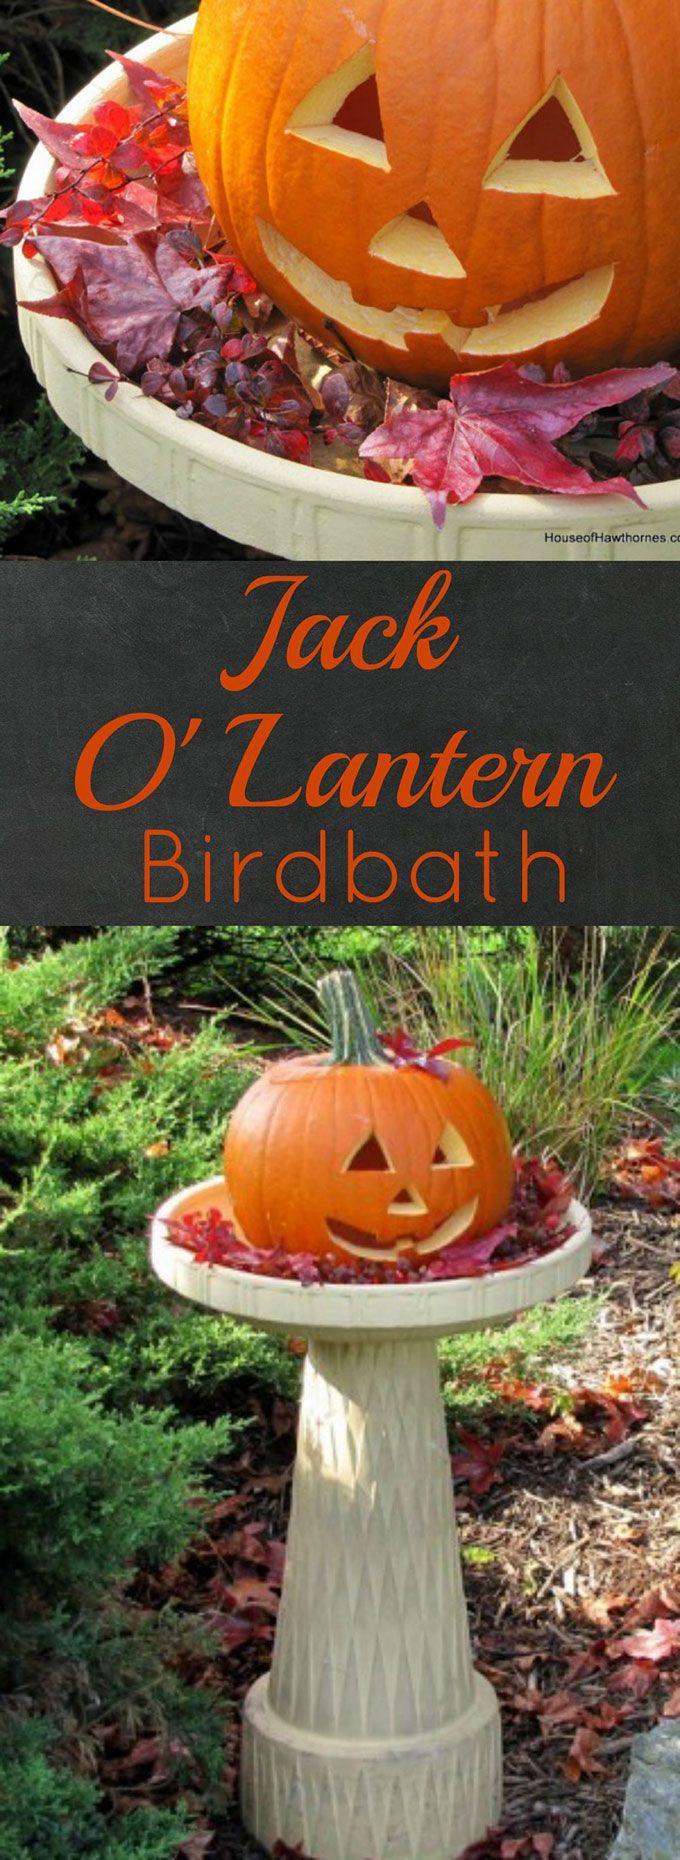 A pumpkin in a birdbath may not